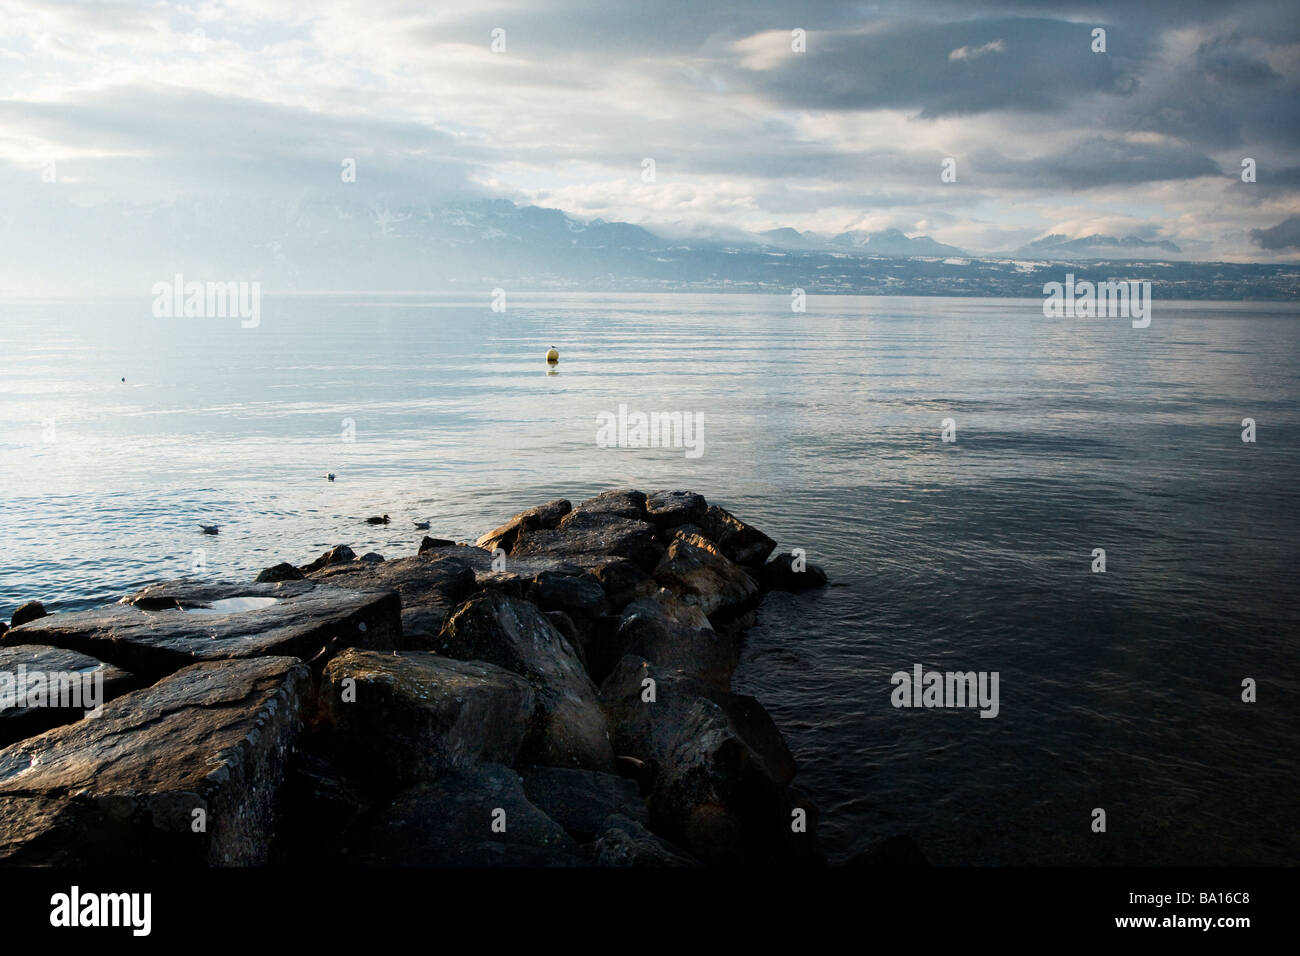 Shoreline of Geneva lake - Stock Image